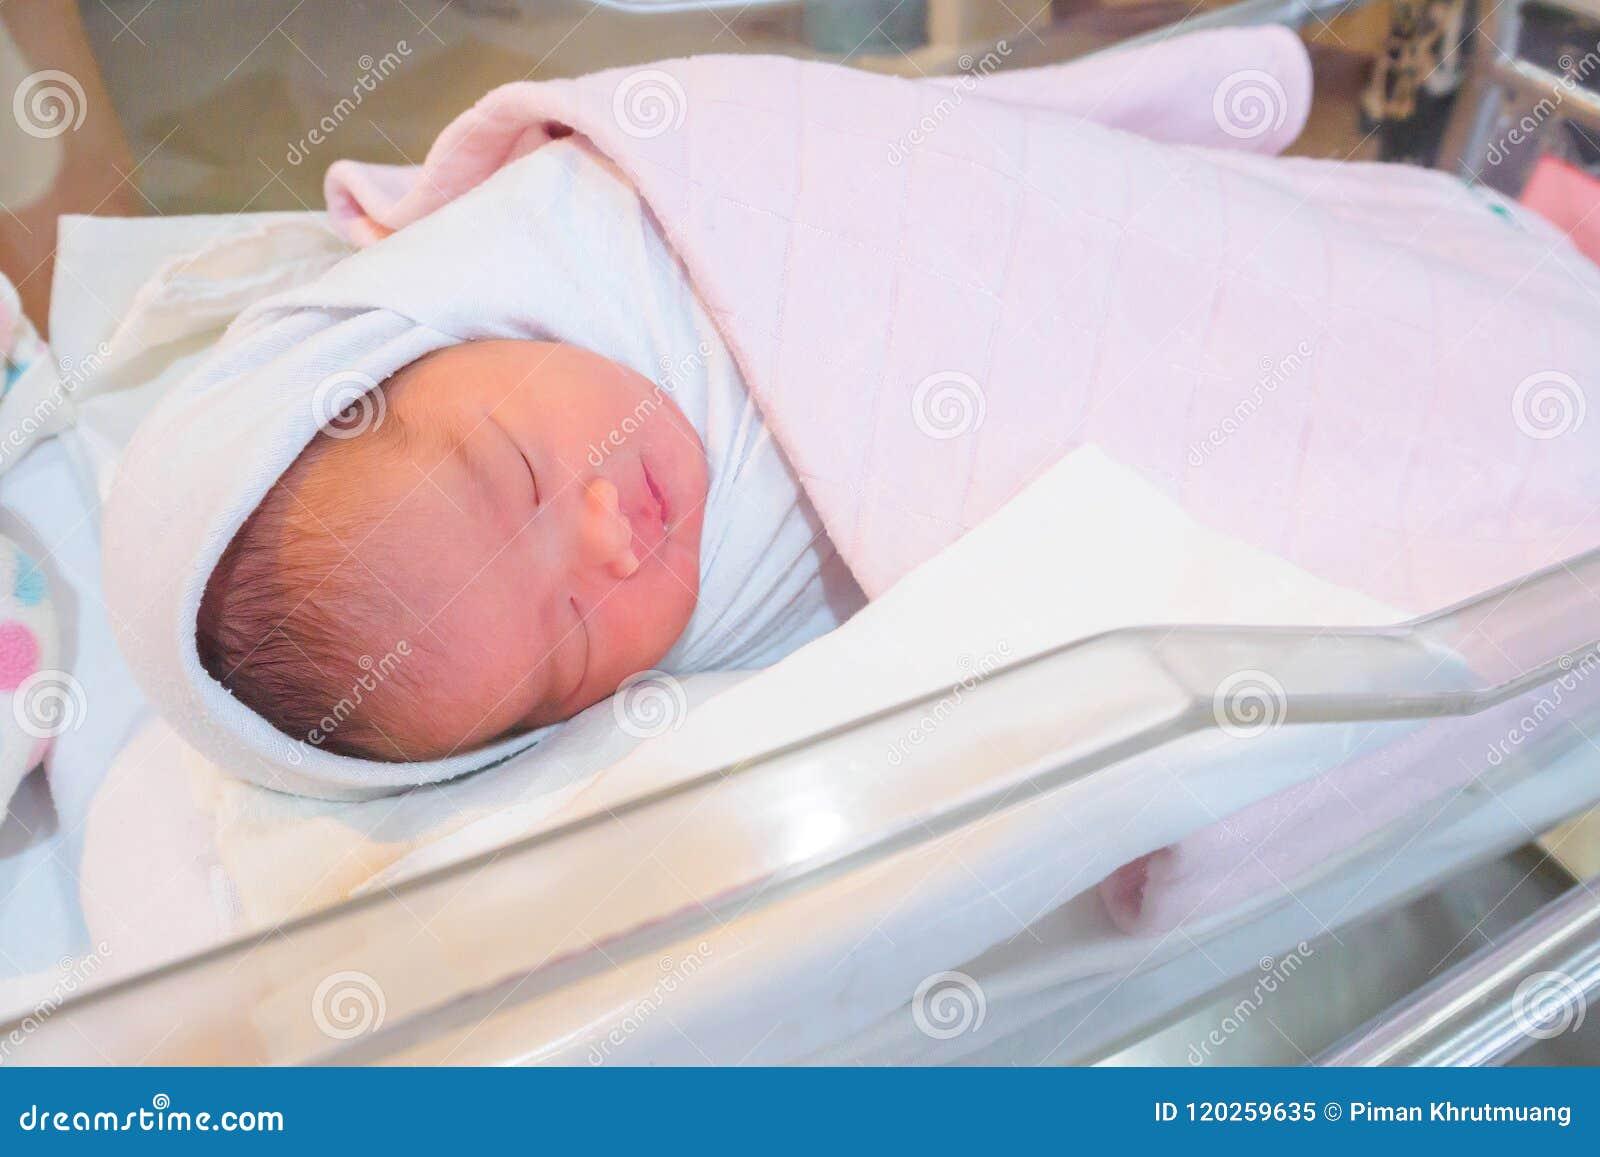 Newborn Baby Girl Sleeping In Hospital Room Stock Image - Image of